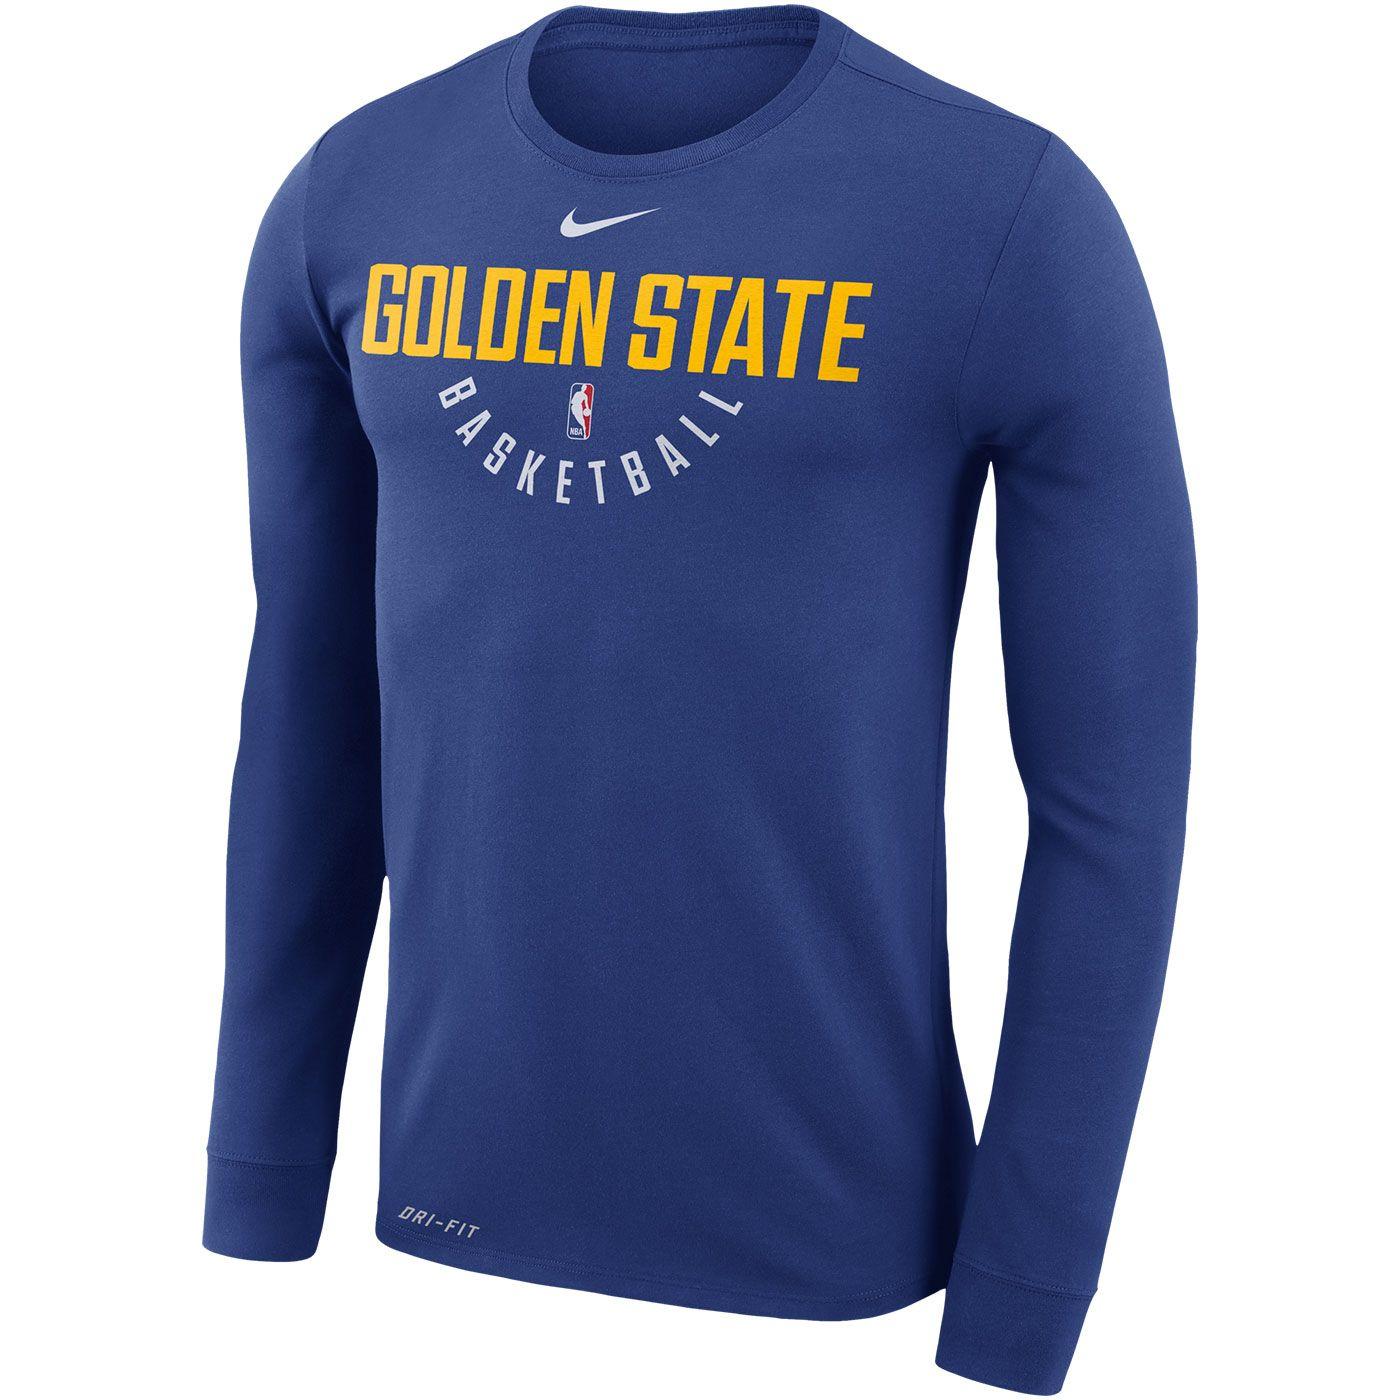 36c24c1ab2d Golden State Warriors Nike Dri-FIT Men's Long Sleeve Practice Tee - Royal